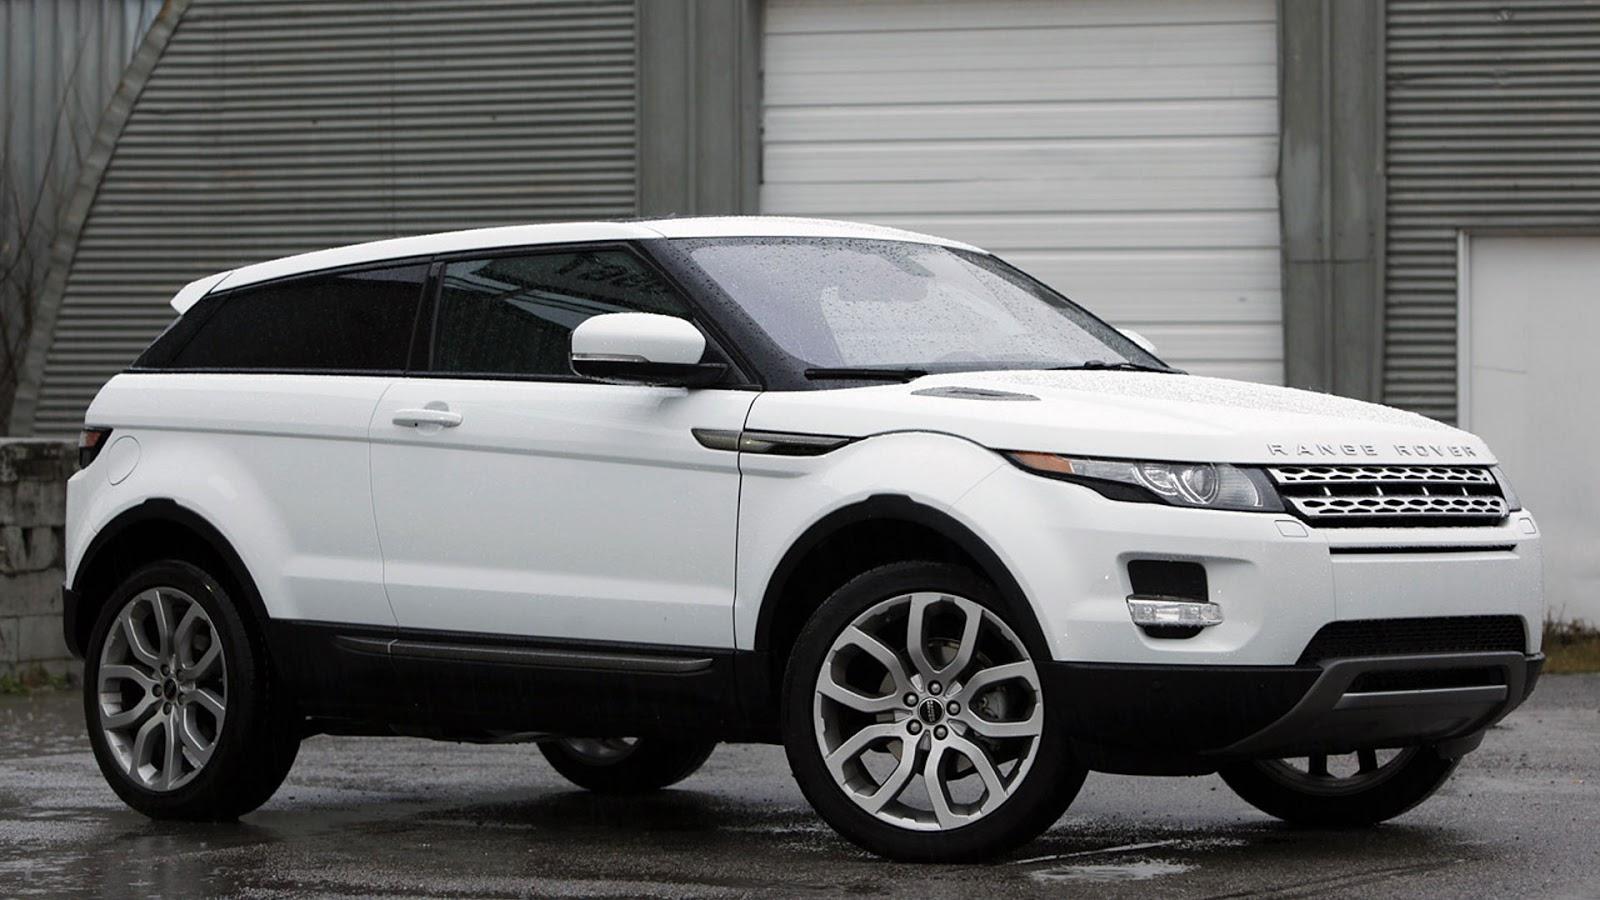 2014 Range Rover Evoque